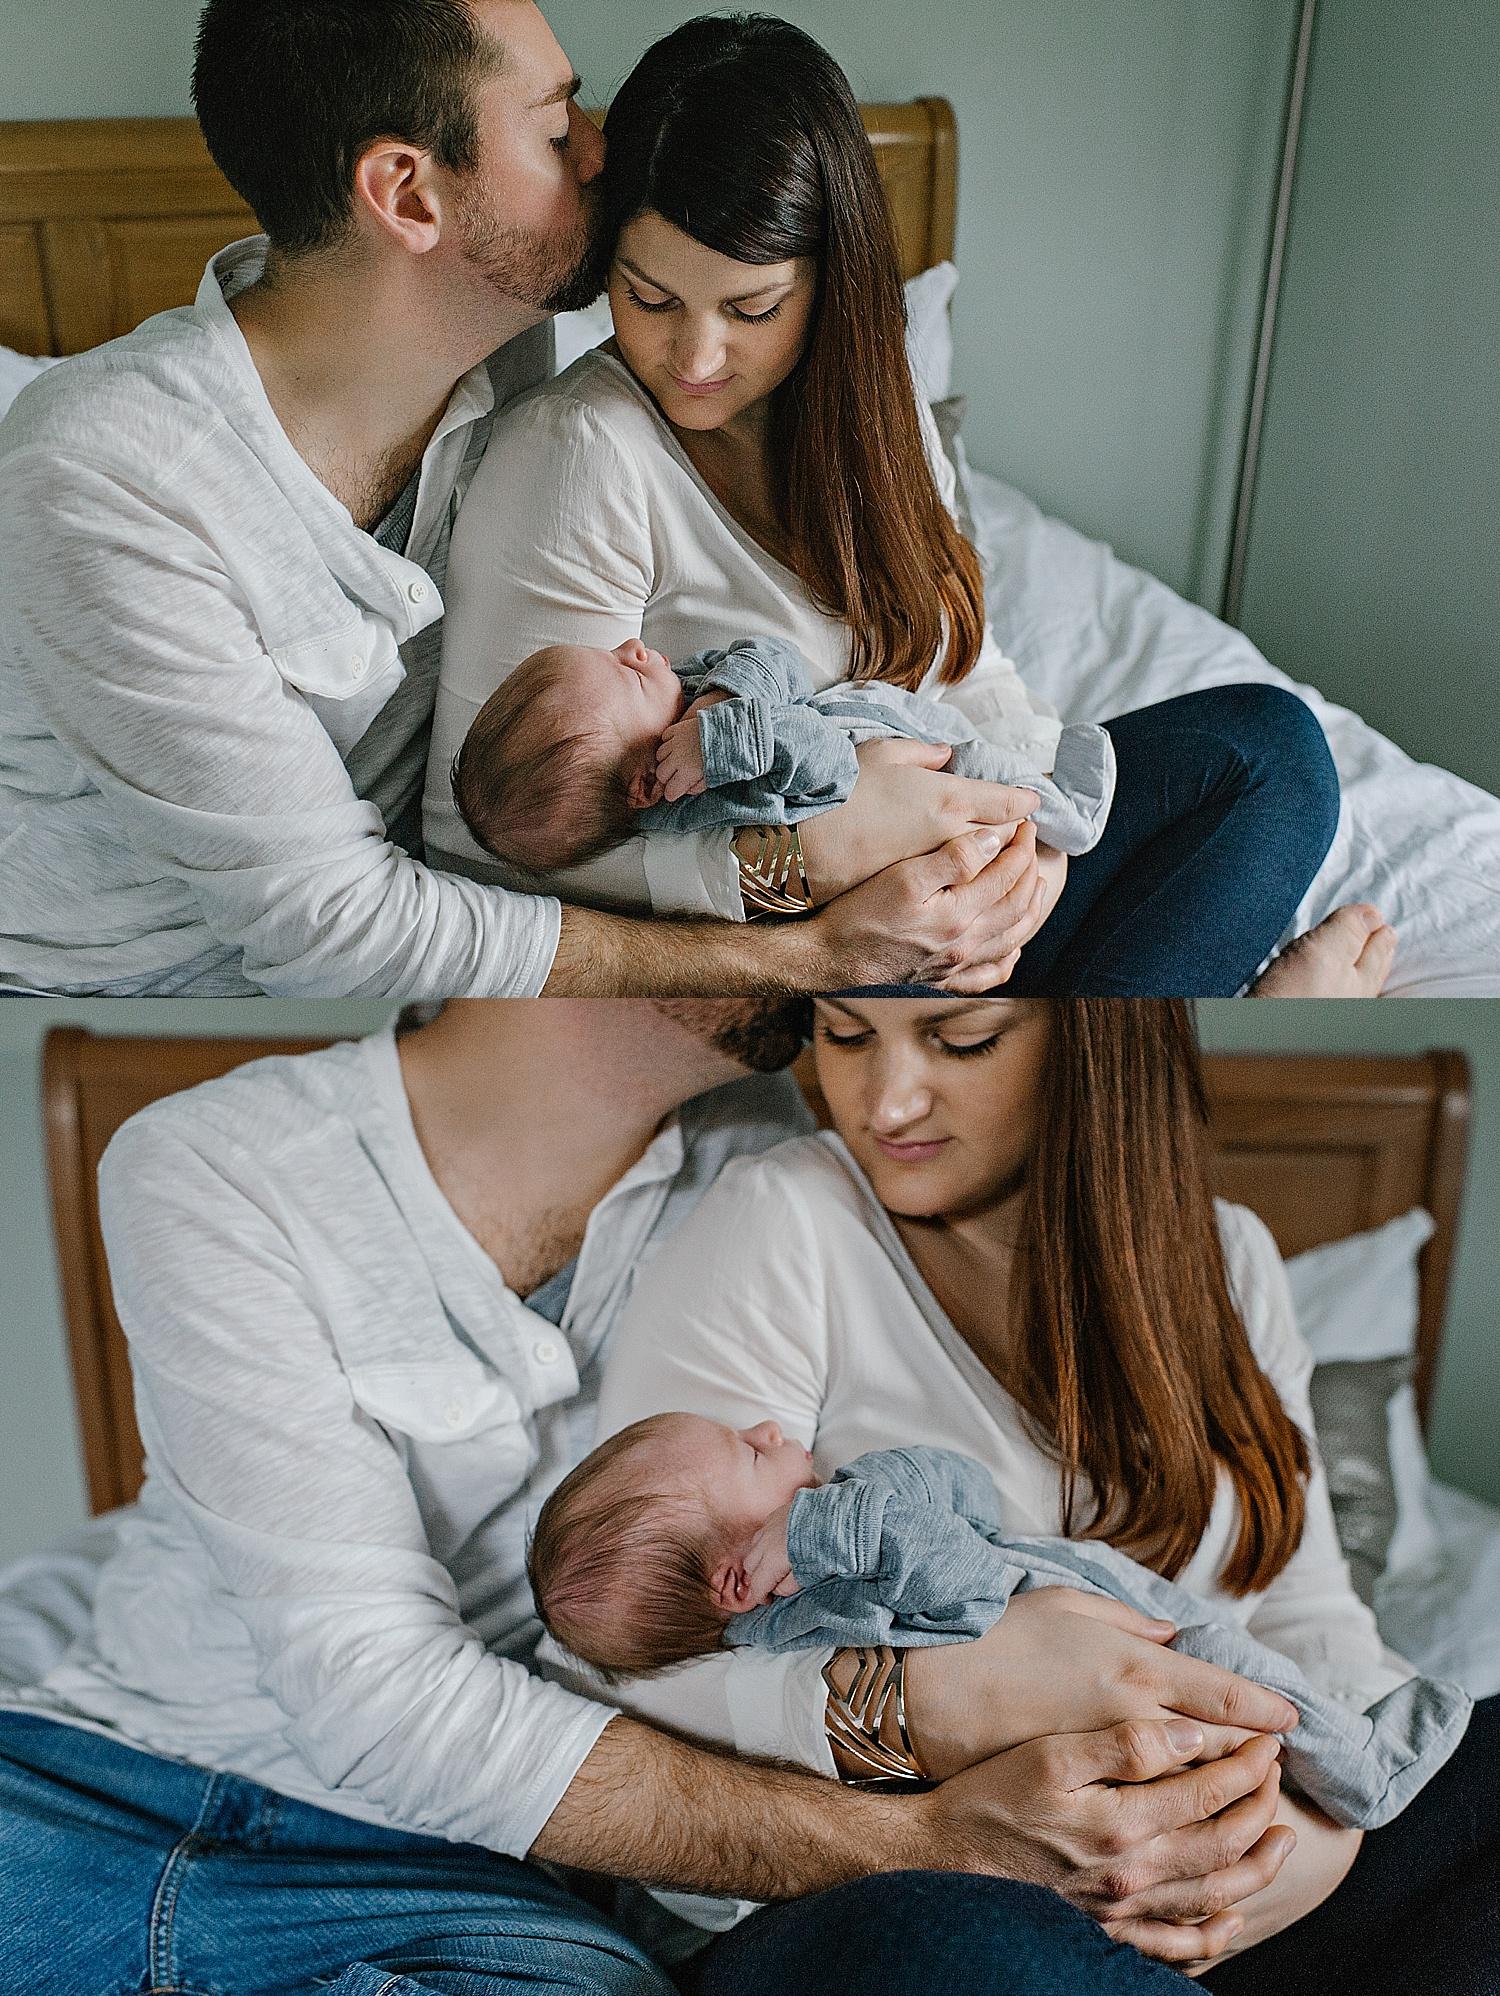 akron-ohio-newborn-family-photographer-lauren-grayson-photography-lifestyle